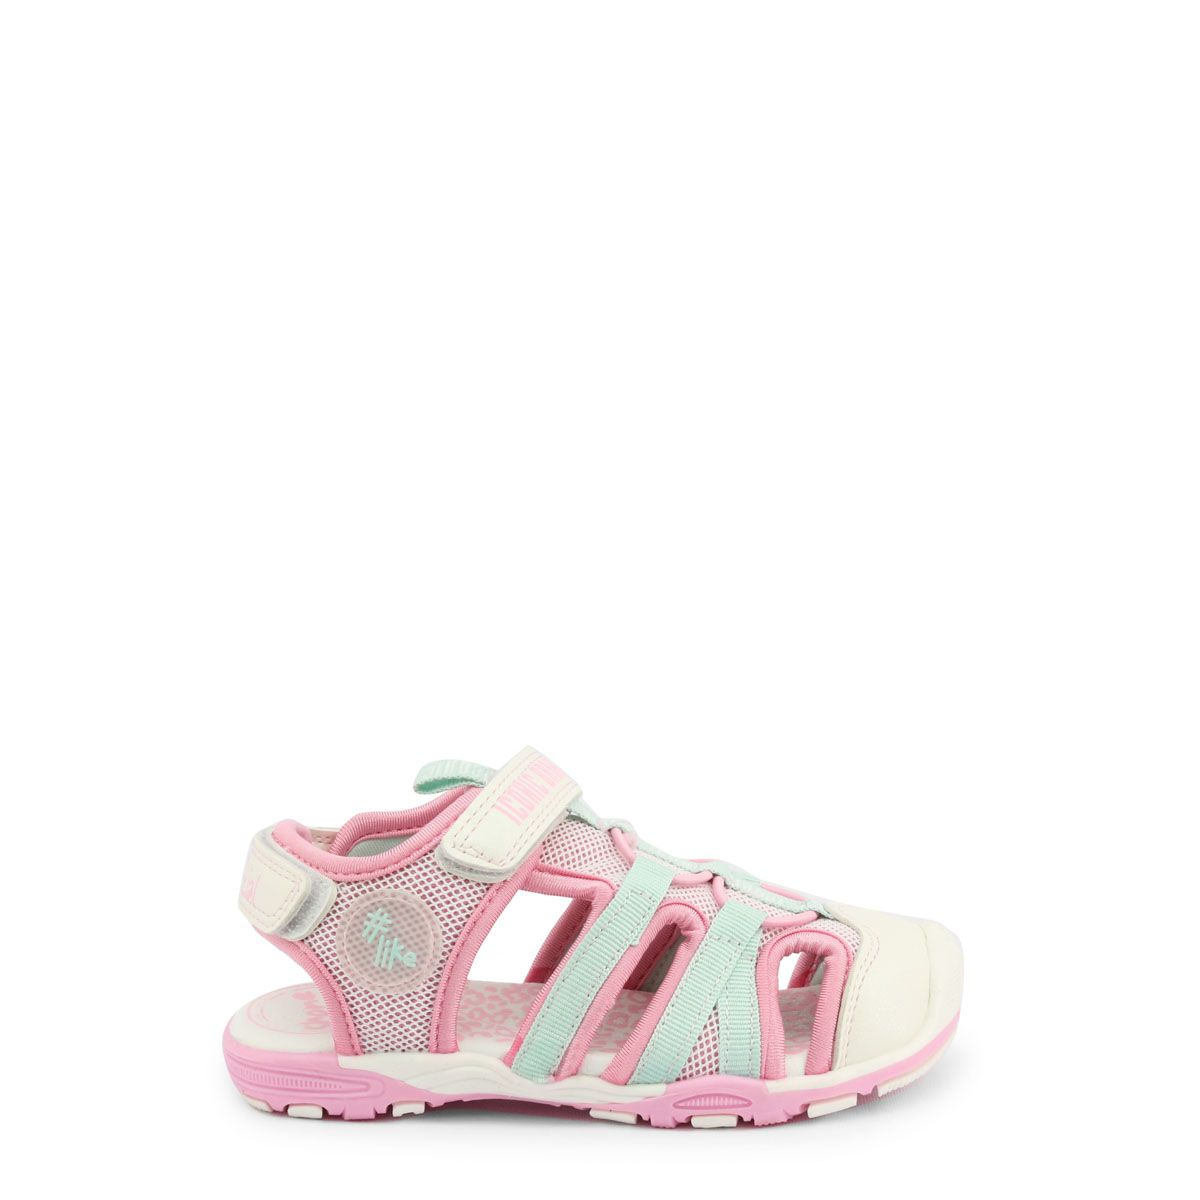 Shone – 3315-035 – Roze Designeritems.nl